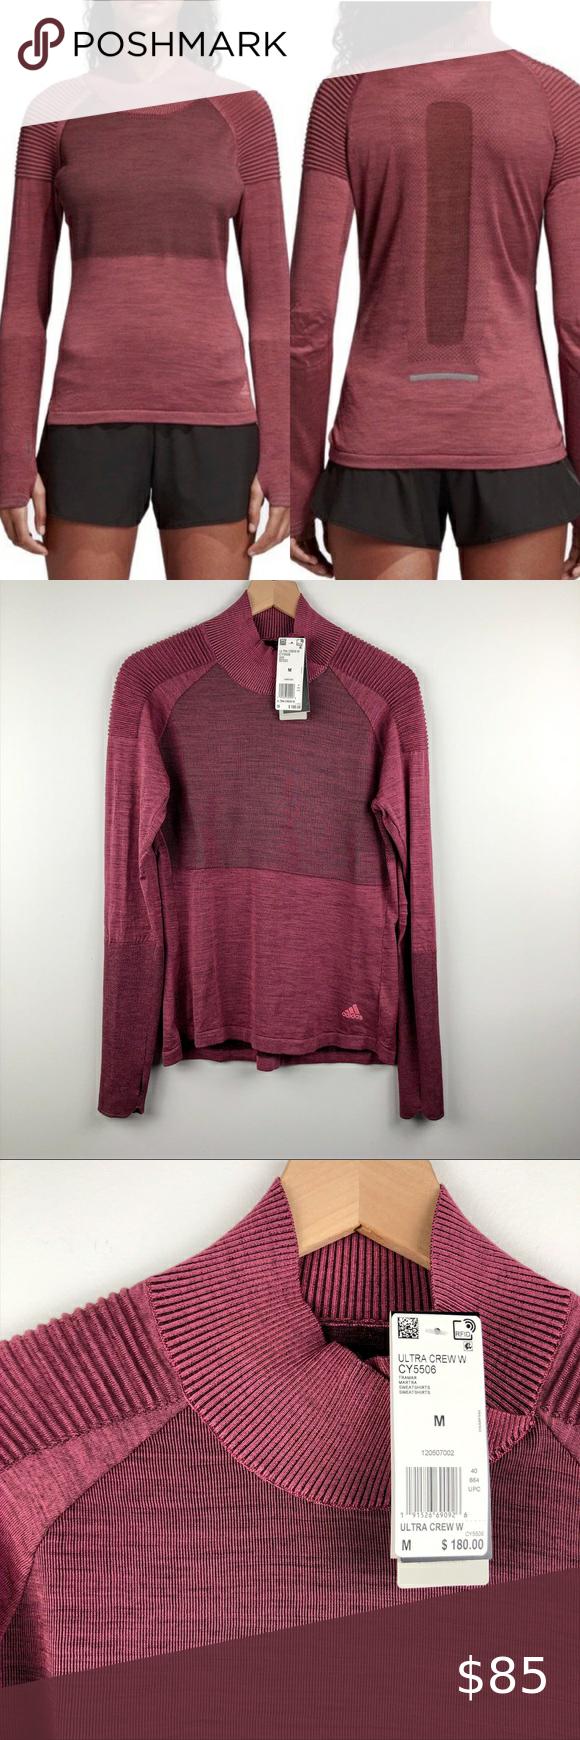 Nwt Adidas Ultra Climaheat Crew Running Top M Running Sweatshirt Running Tops Clothes Design [ 1740 x 580 Pixel ]